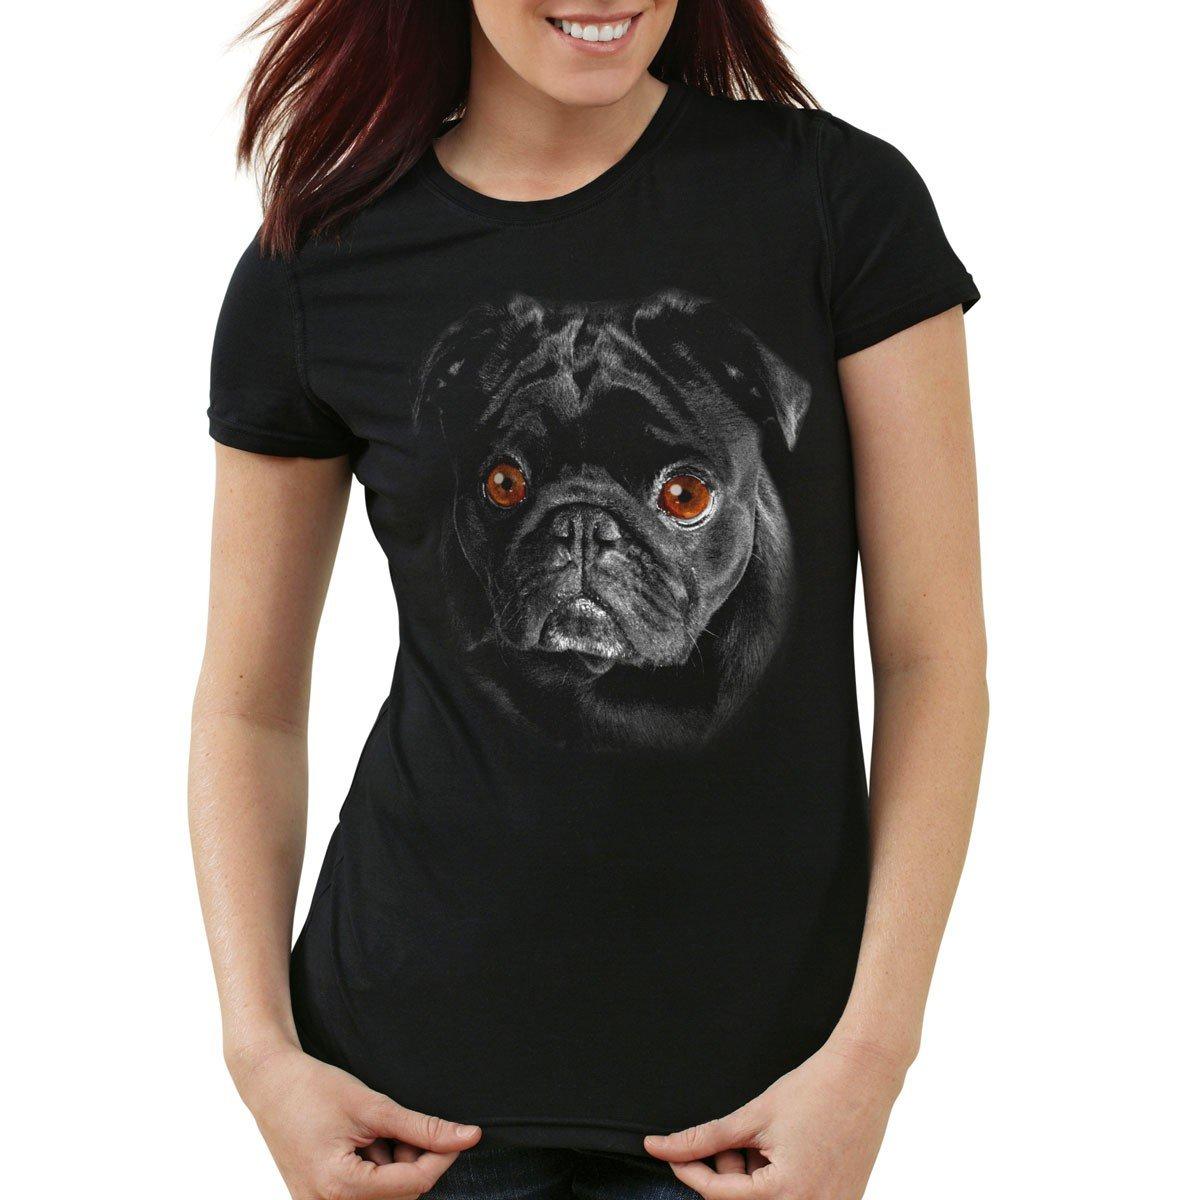 3758c01dd817 style3 Bronx T-Shirt Damen Hundegesicht Mops Hund  Amazon.de  Bekleidung